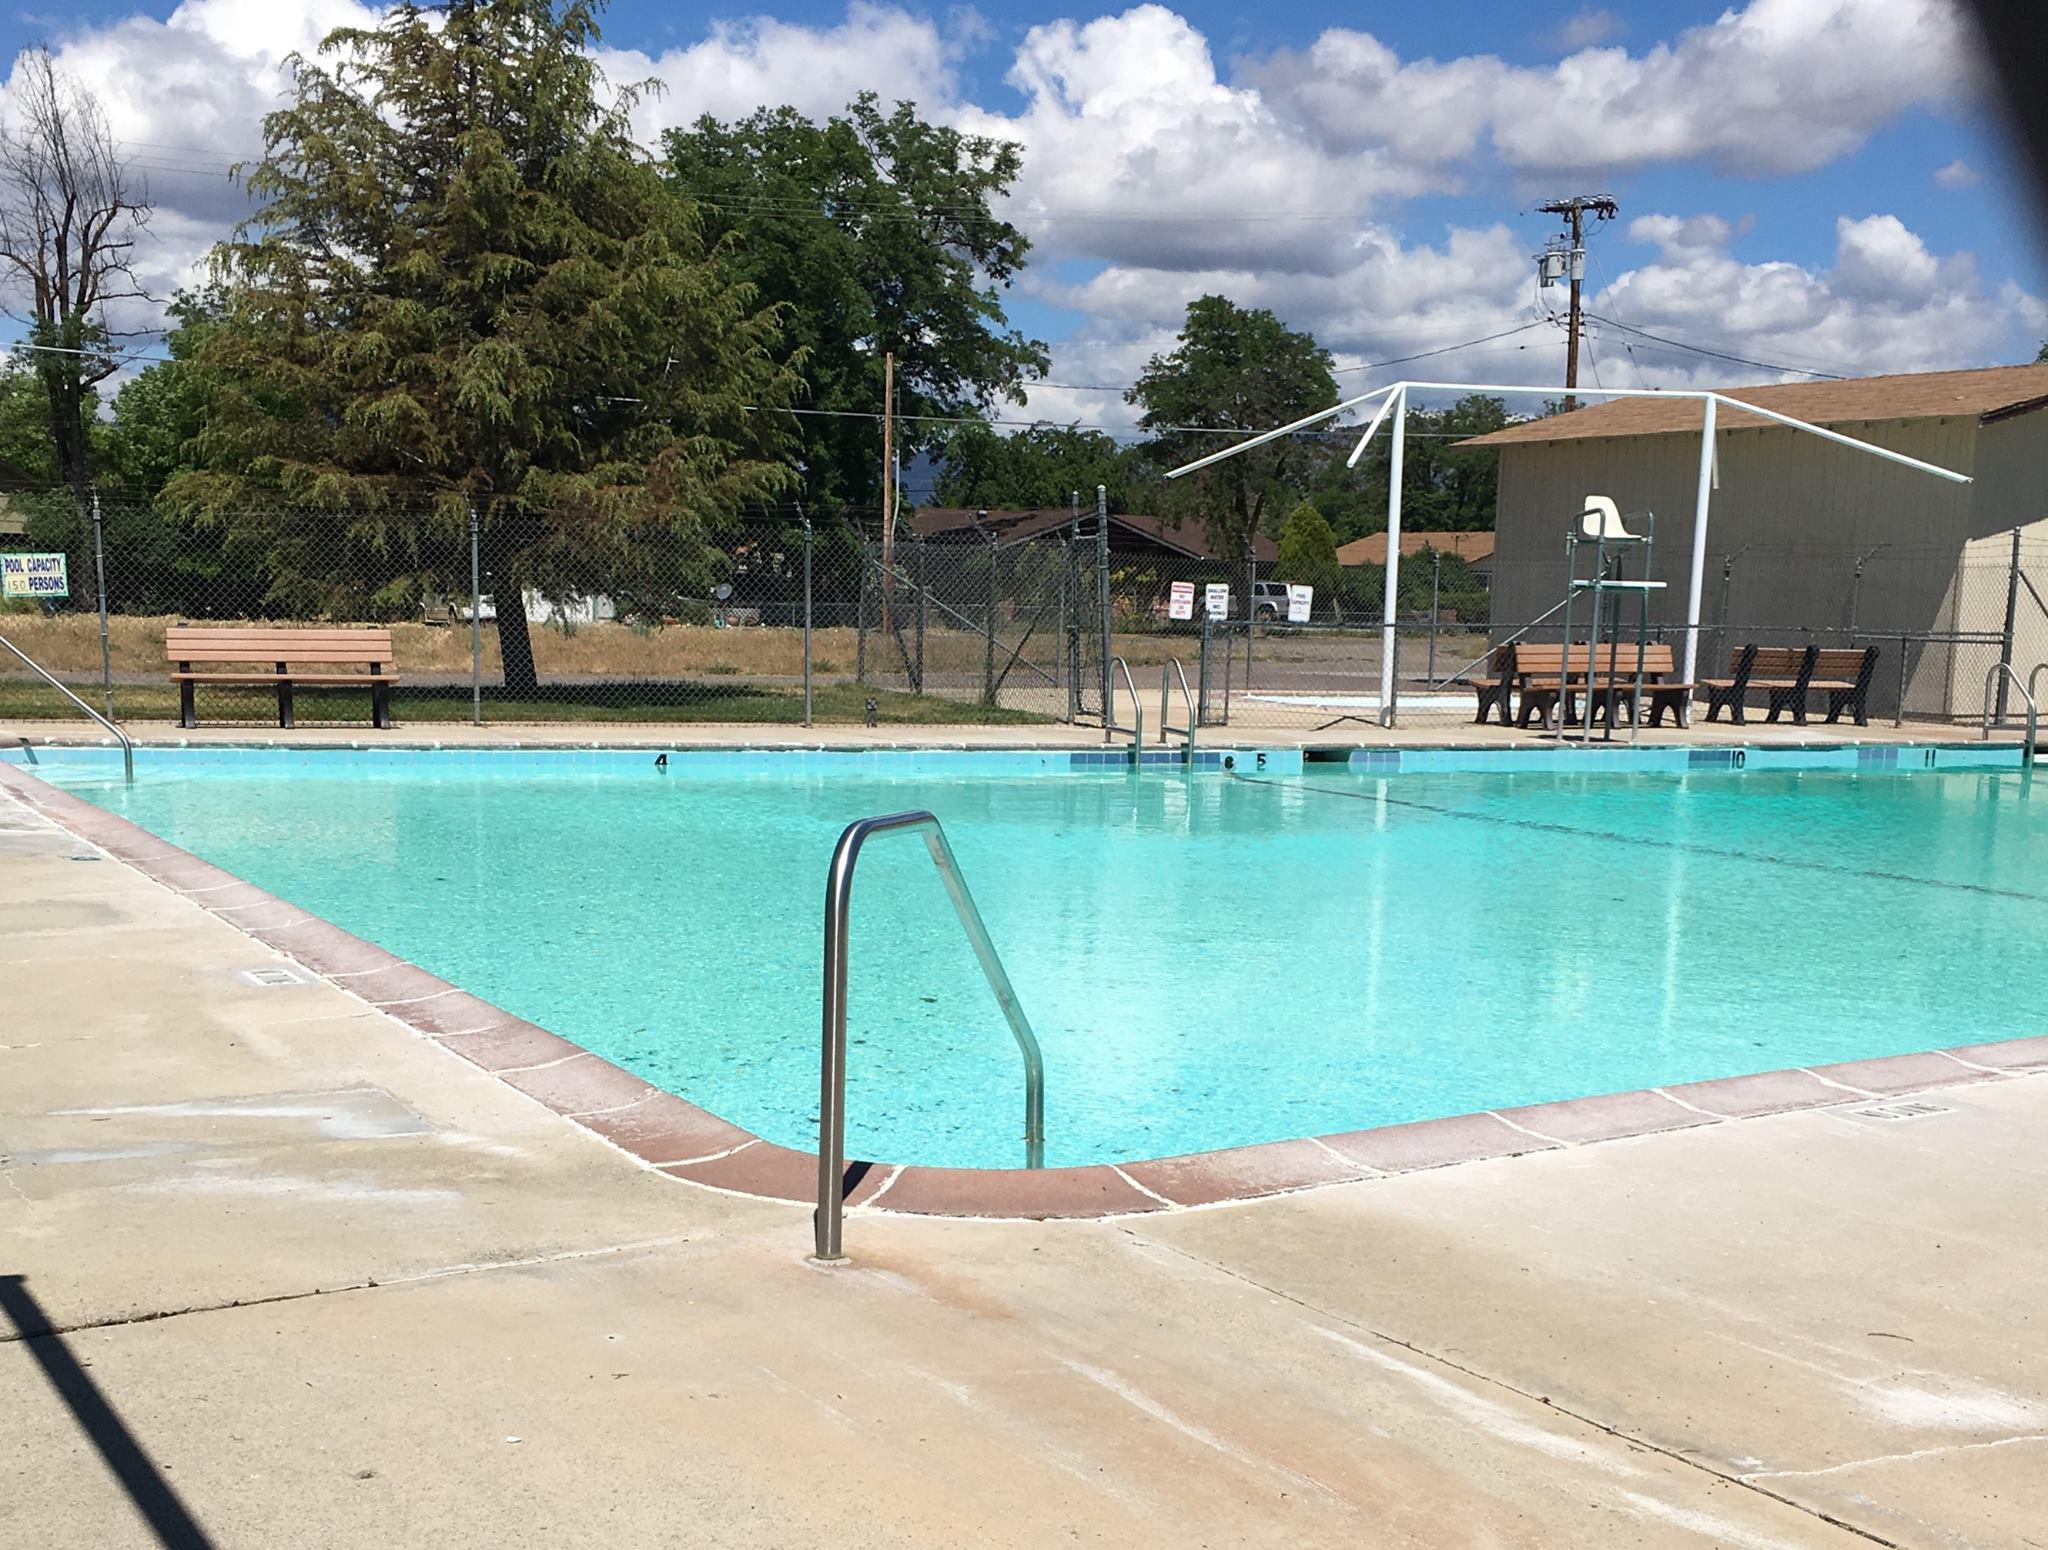 montague pool1